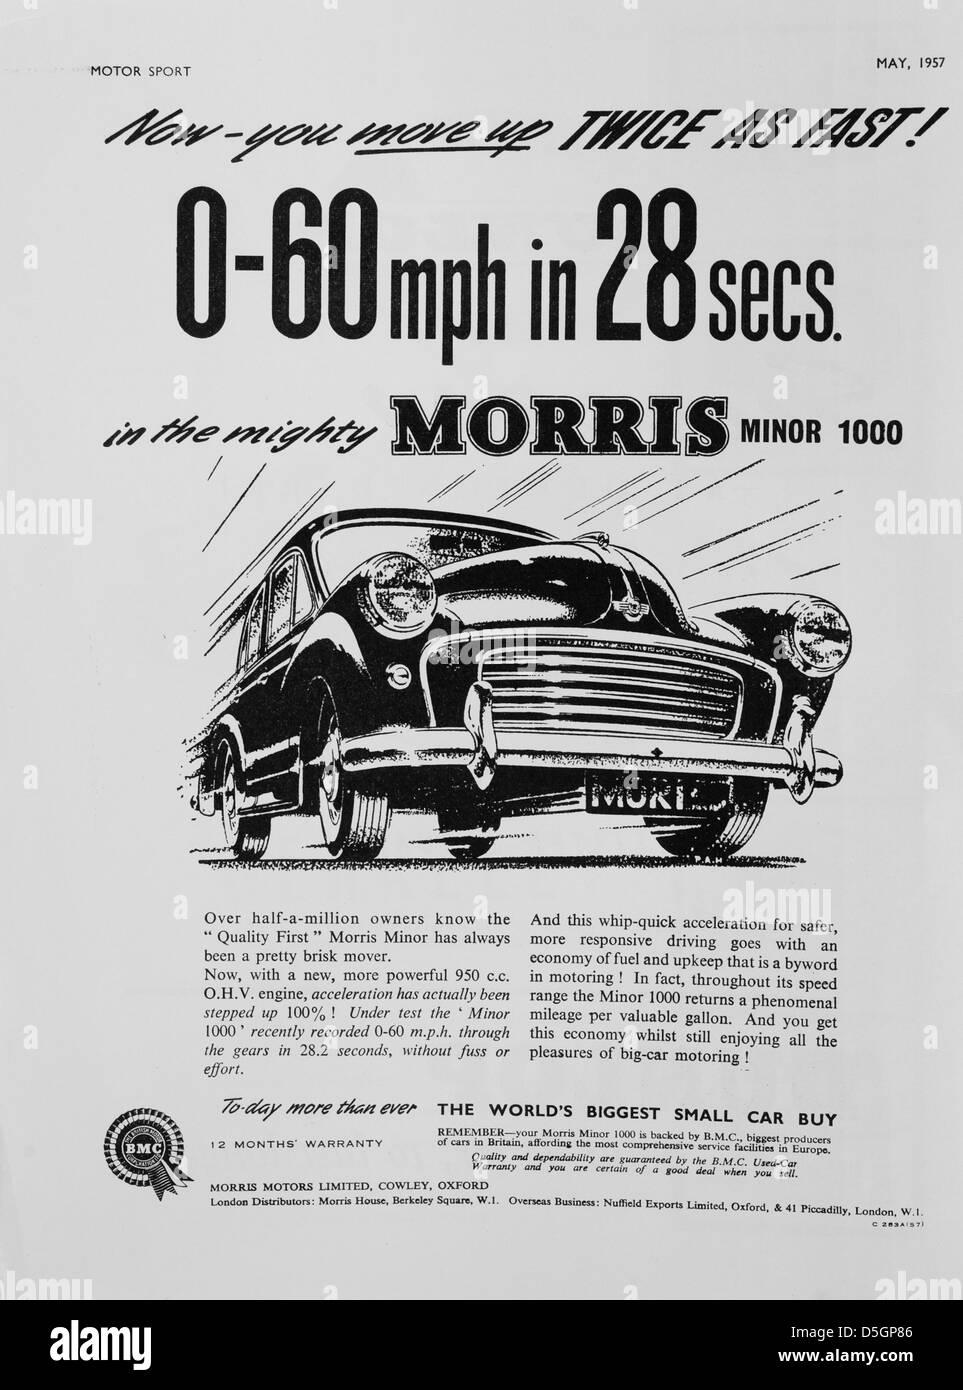 Morris Minor 1000 advetisement en el deporte del motor, Mayo 1957 Imagen De Stock